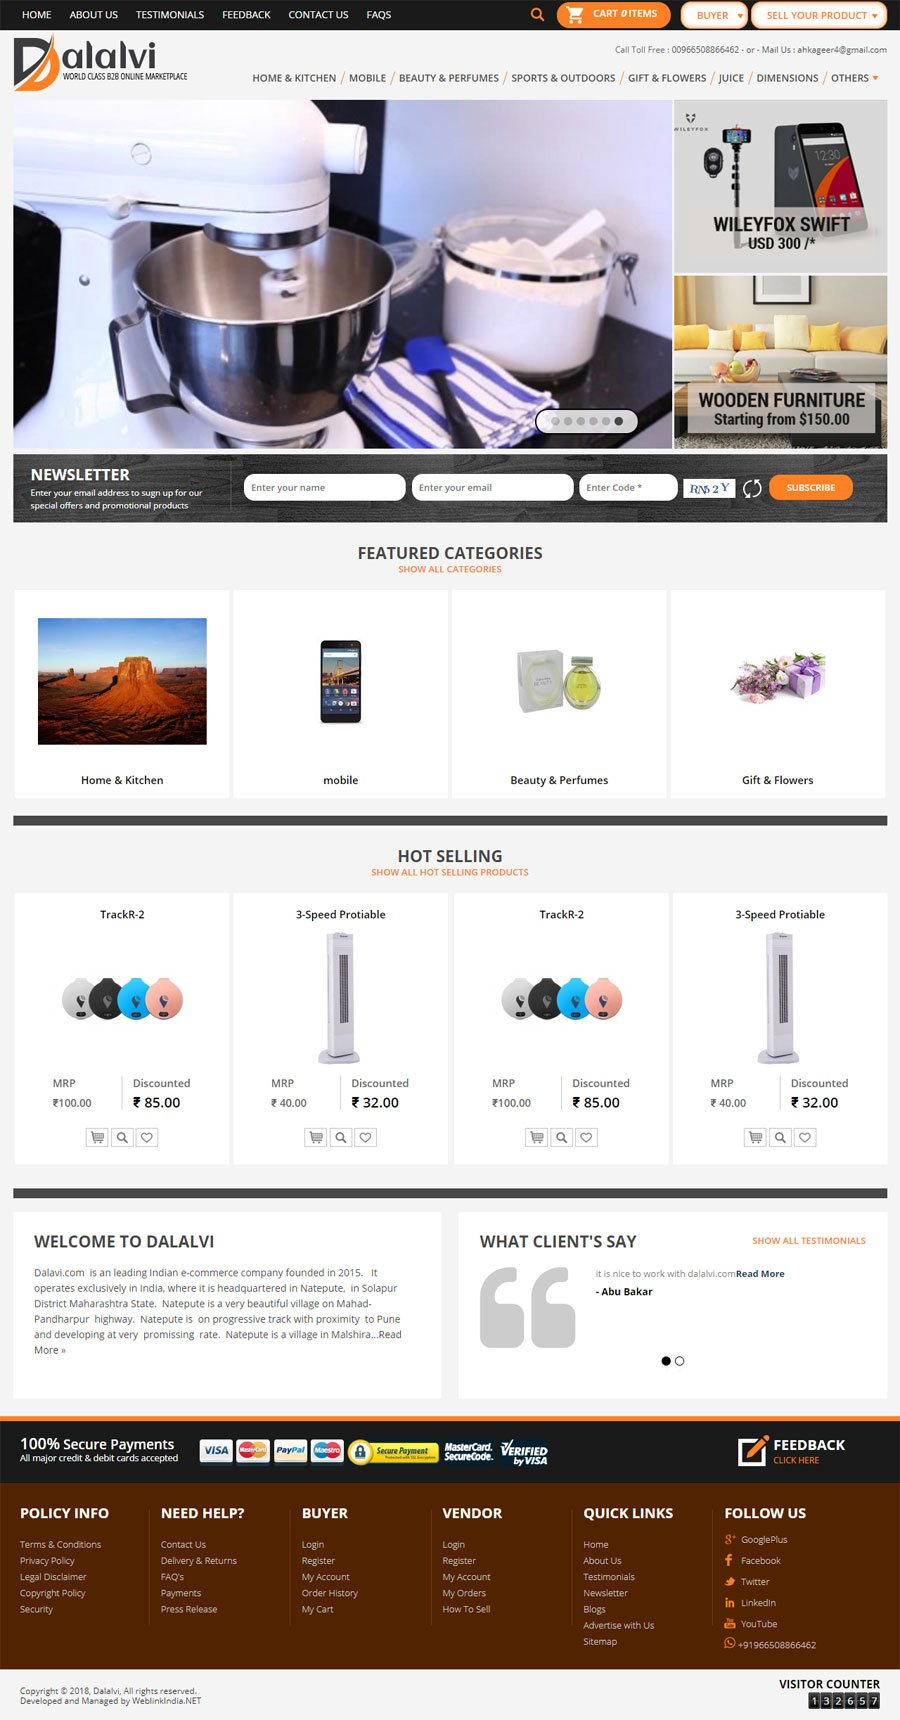 DALALVI Saudi Arabia Web Design